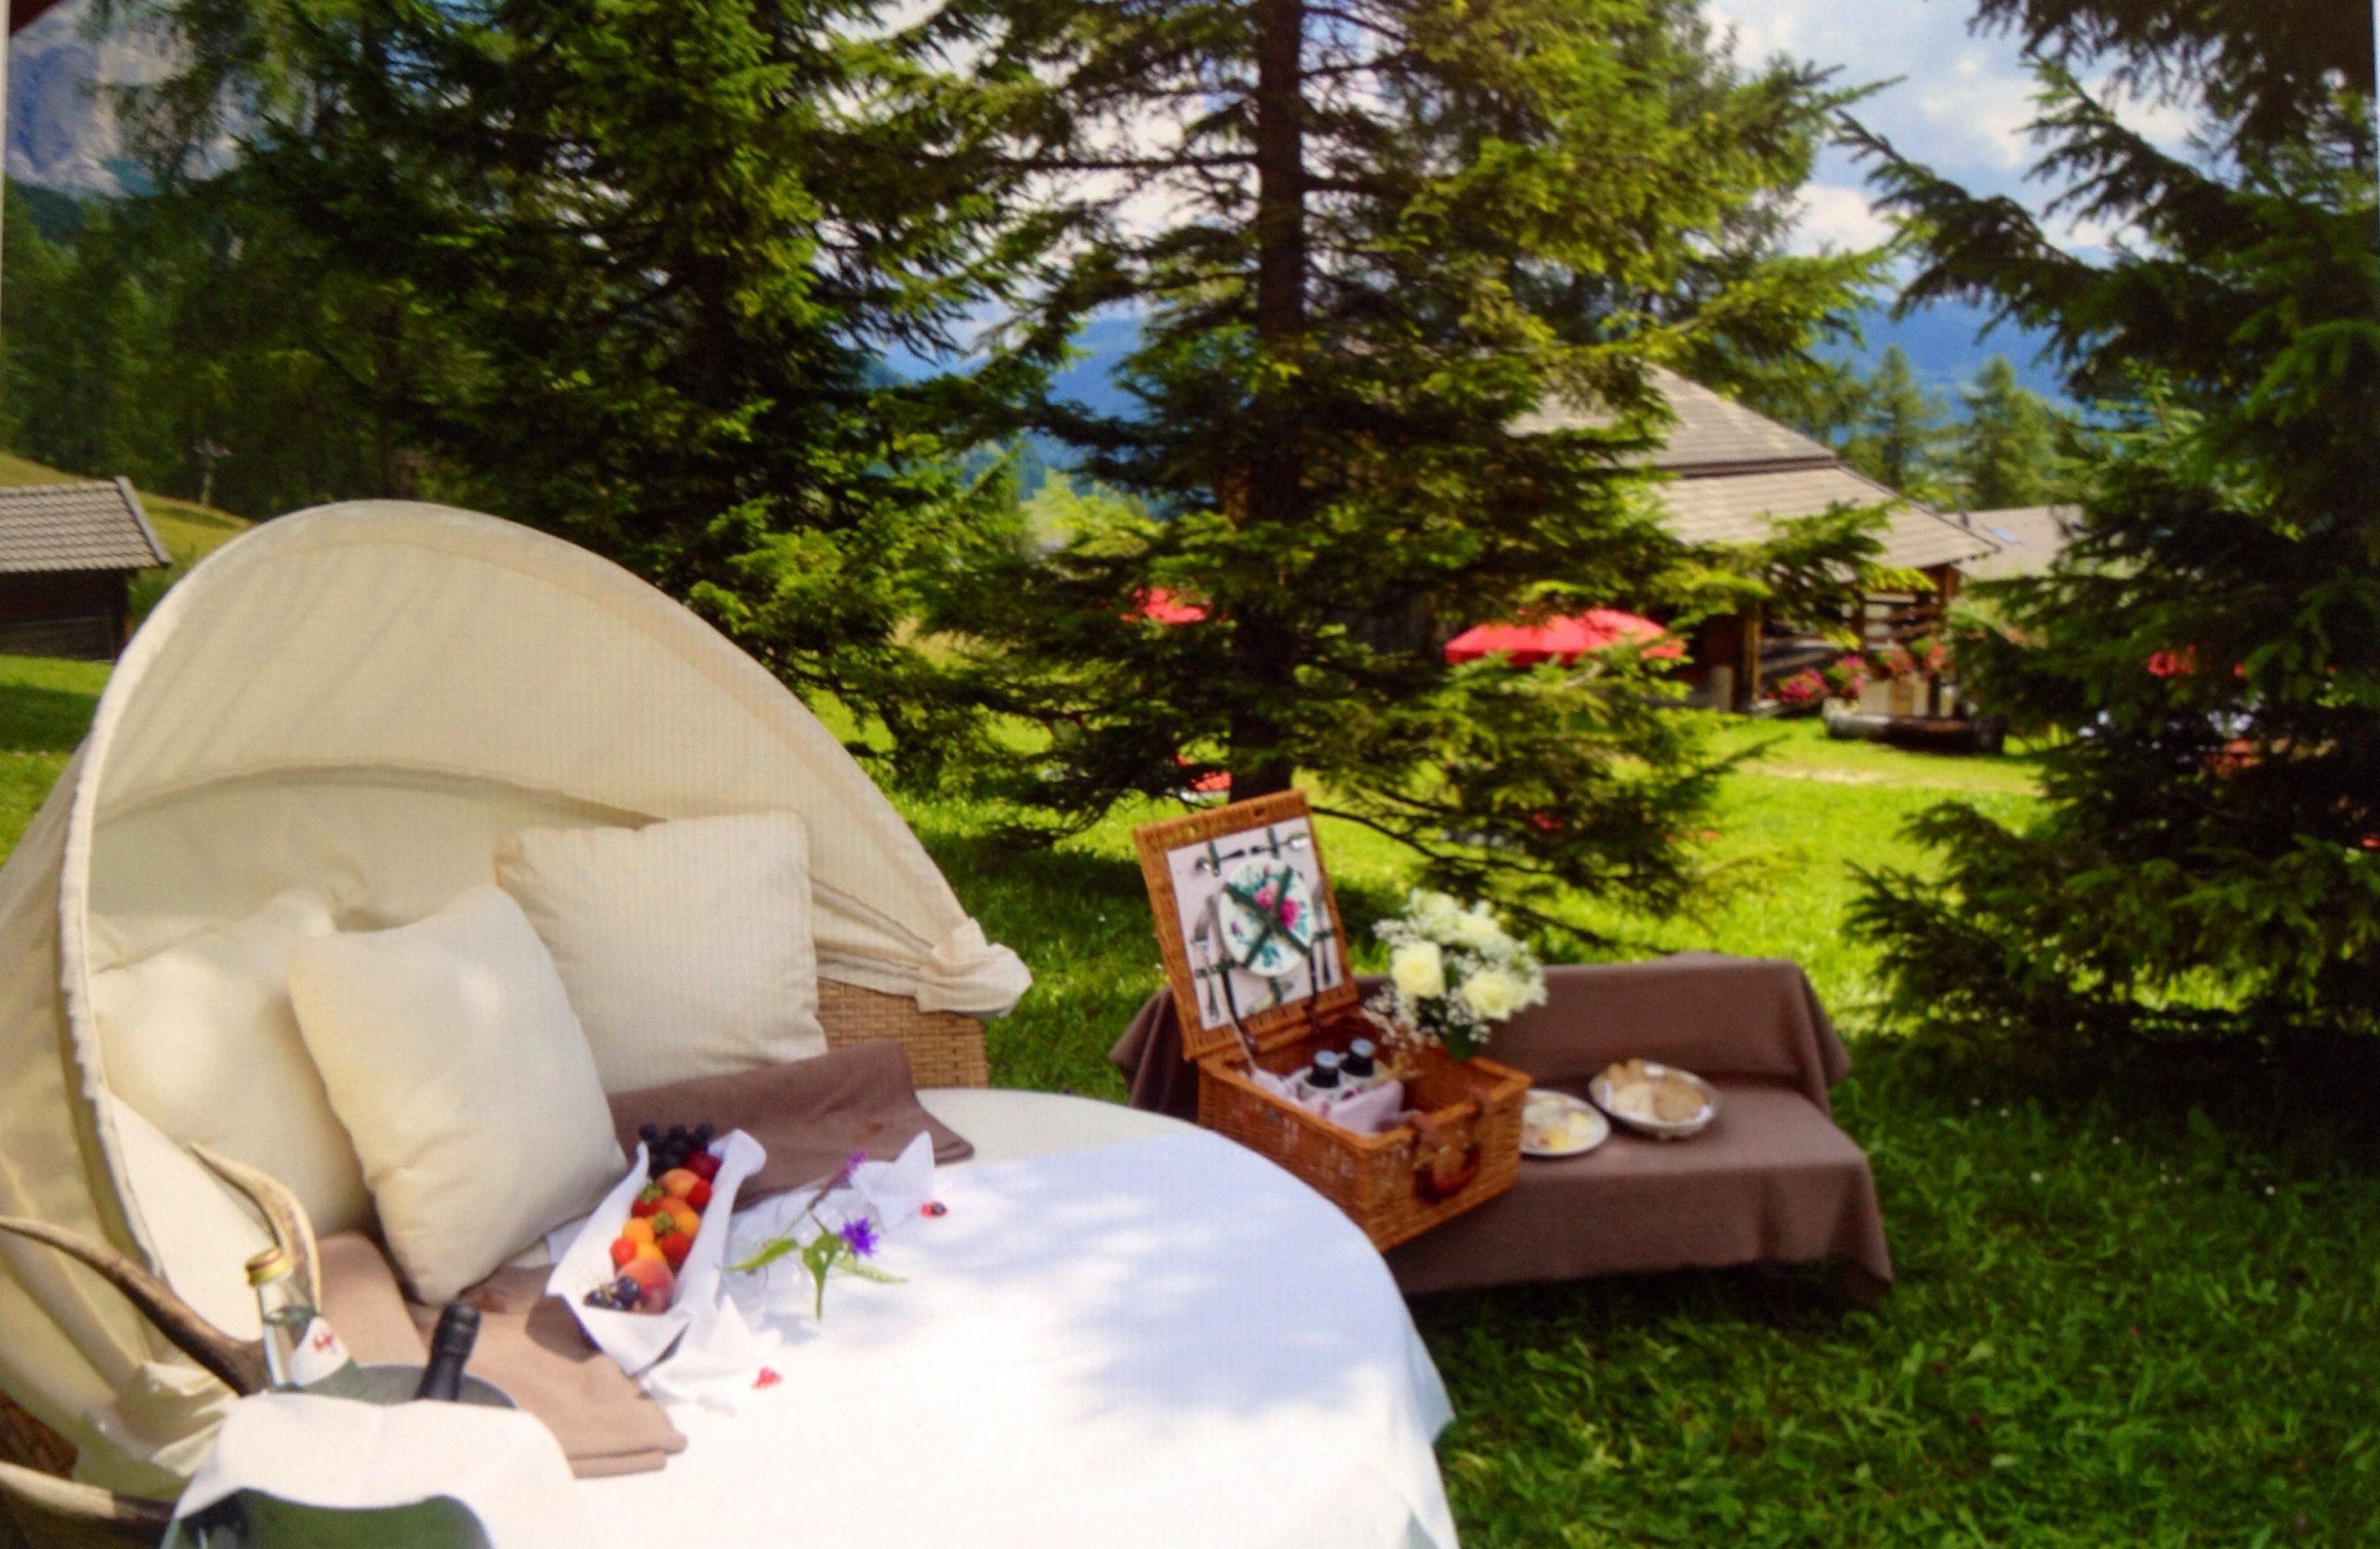 Matrimonio Bianco e Fucsia in Alta Badia